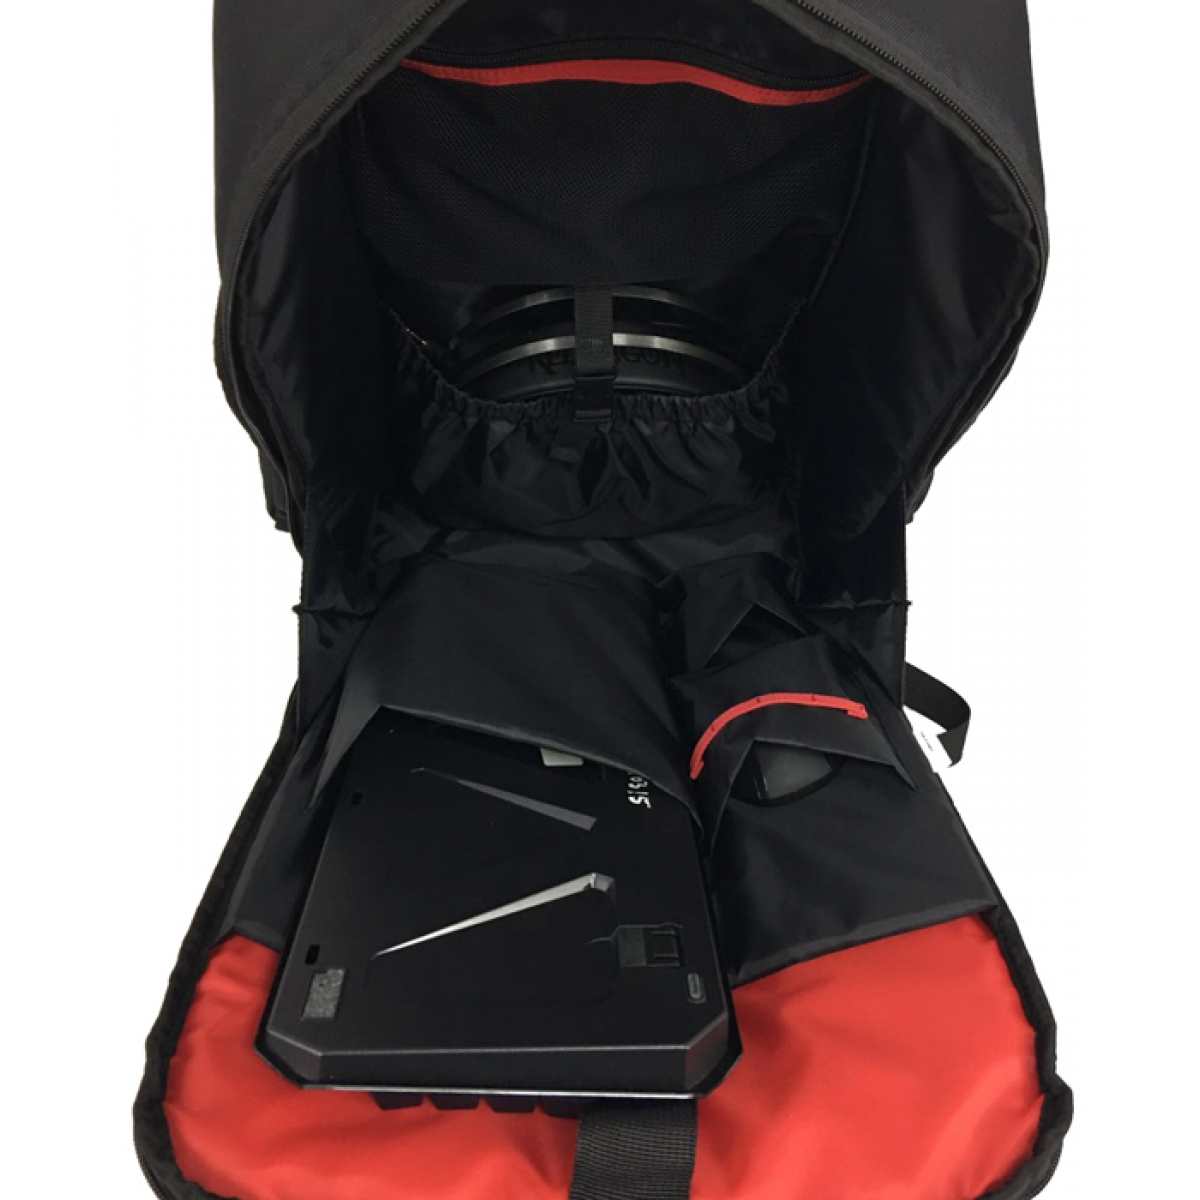 Mochila Redragon Tadis GB-100 Preta/Vermelha